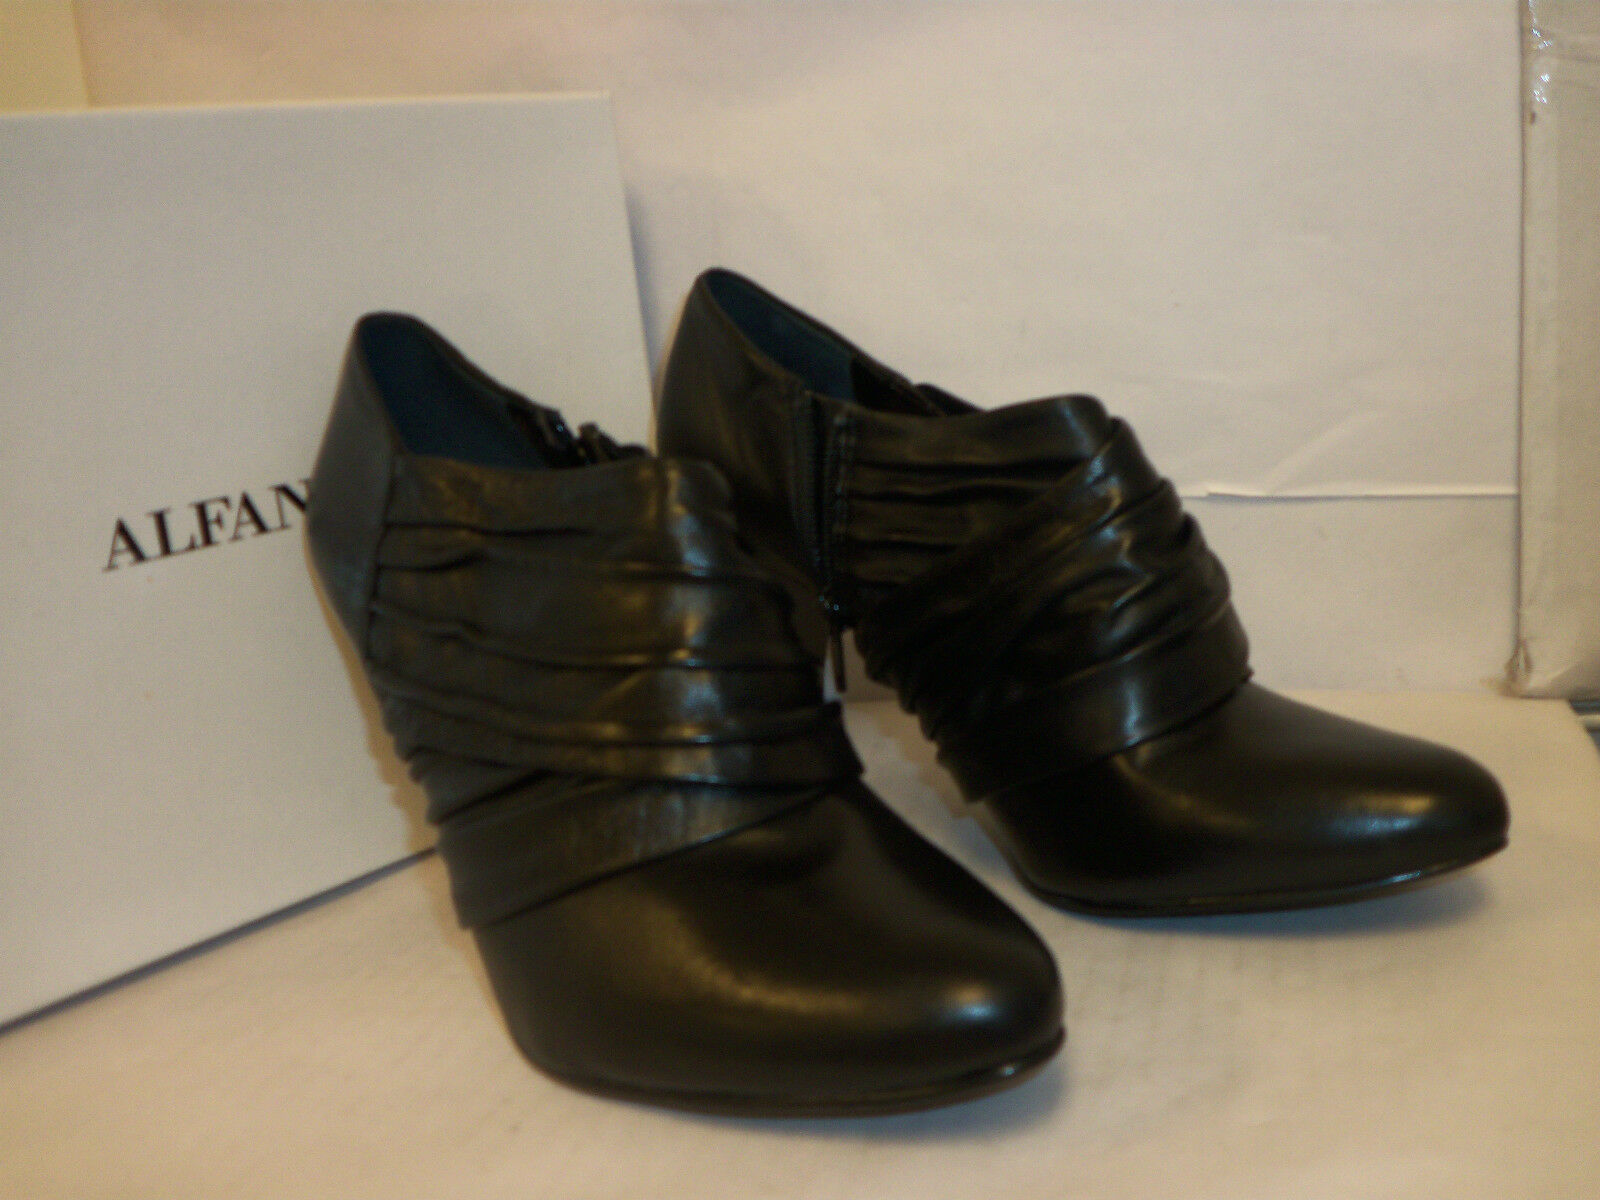 Alfani New Womens Carla Black 10 M Heels Boots Shoes